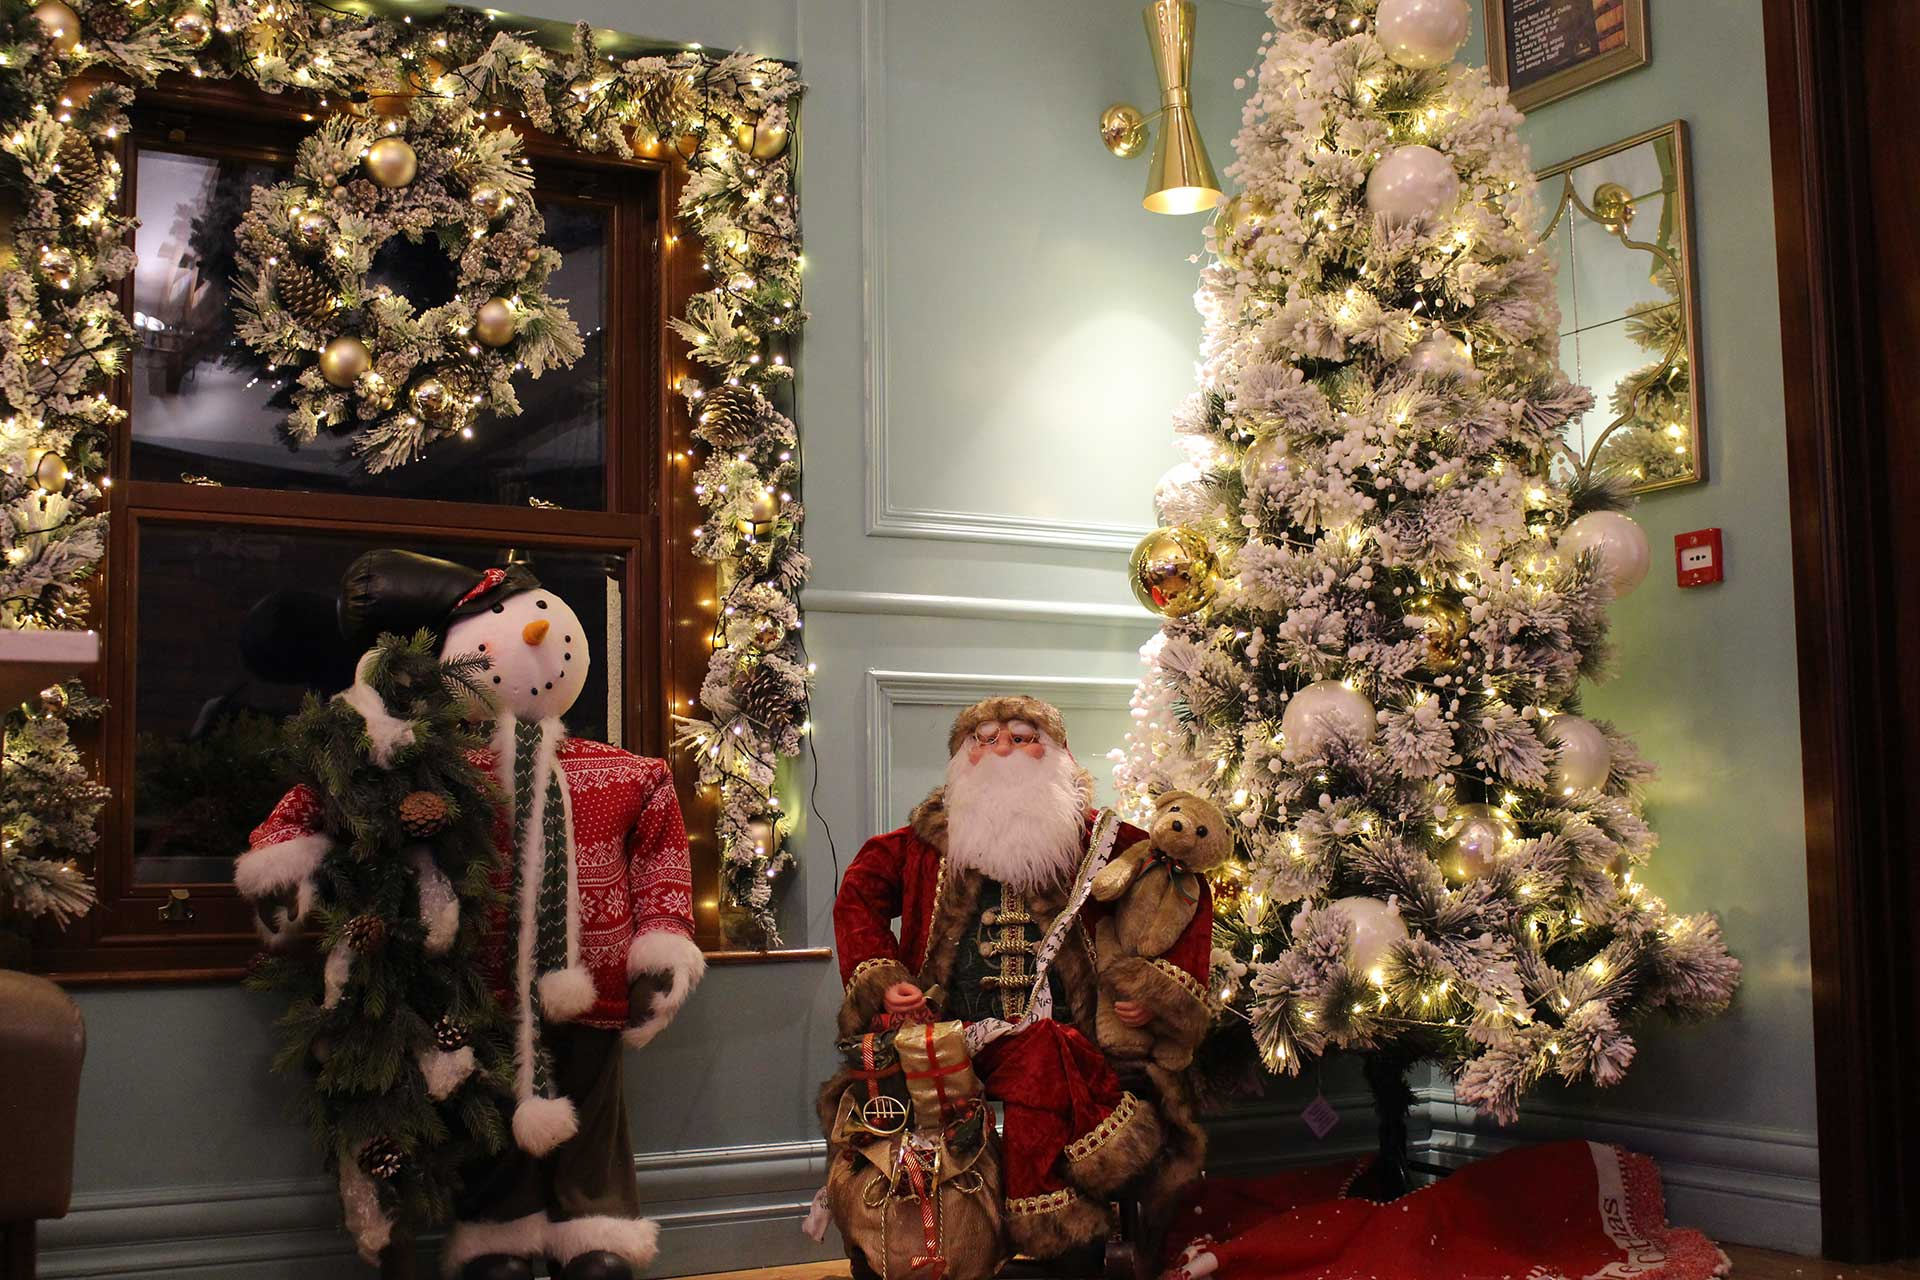 kealys-best-christmas-parties-swords-county-dublin